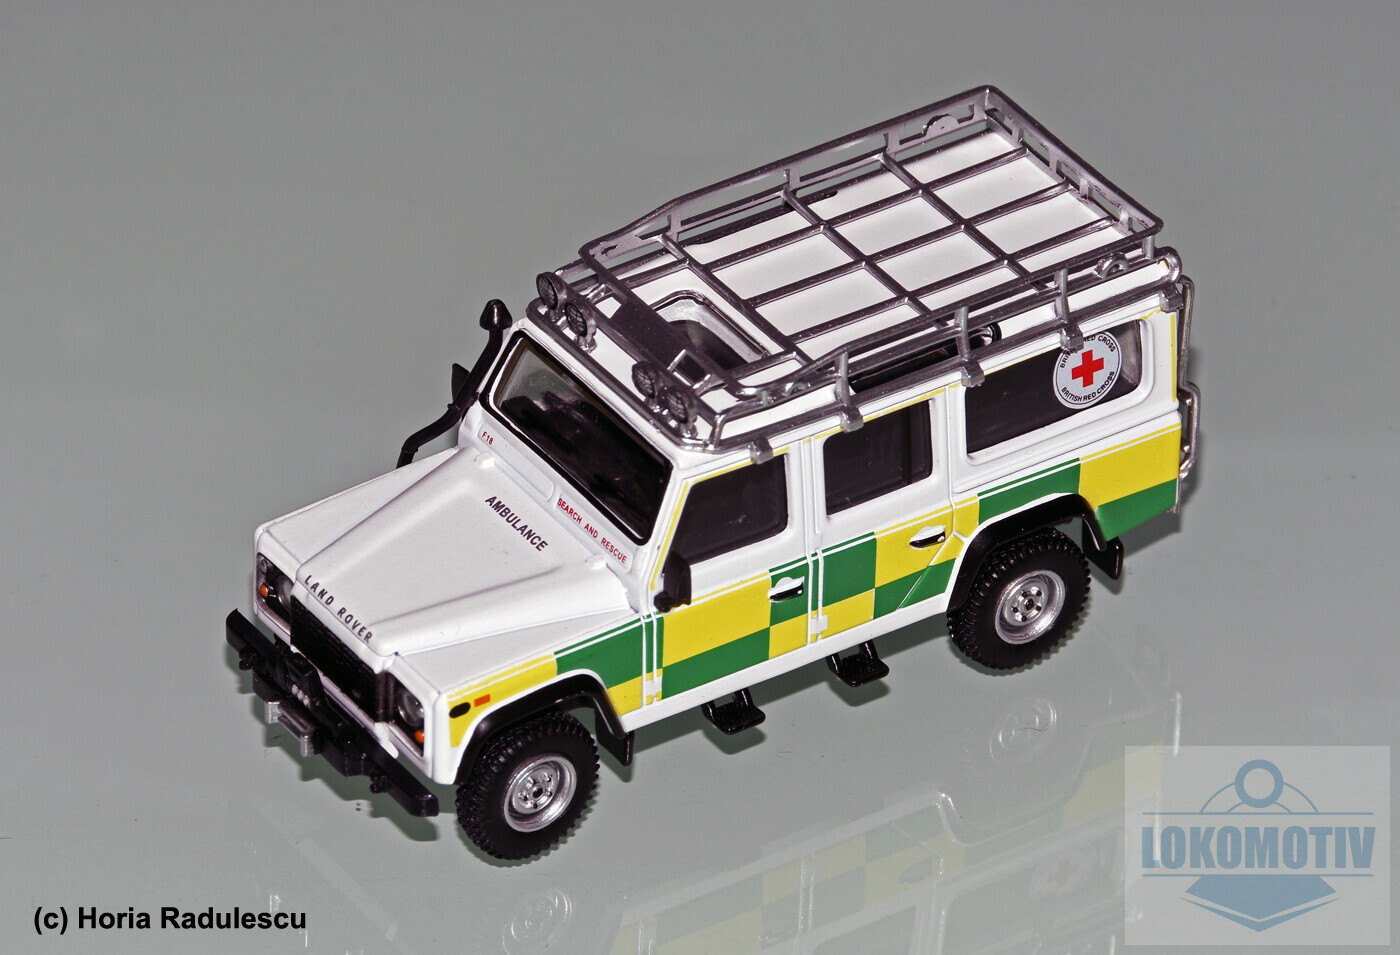 64-GB-Battenberg-Search-Rescue-Land-Rover-110-MiniGT-14b728ee3ea874129.jpg